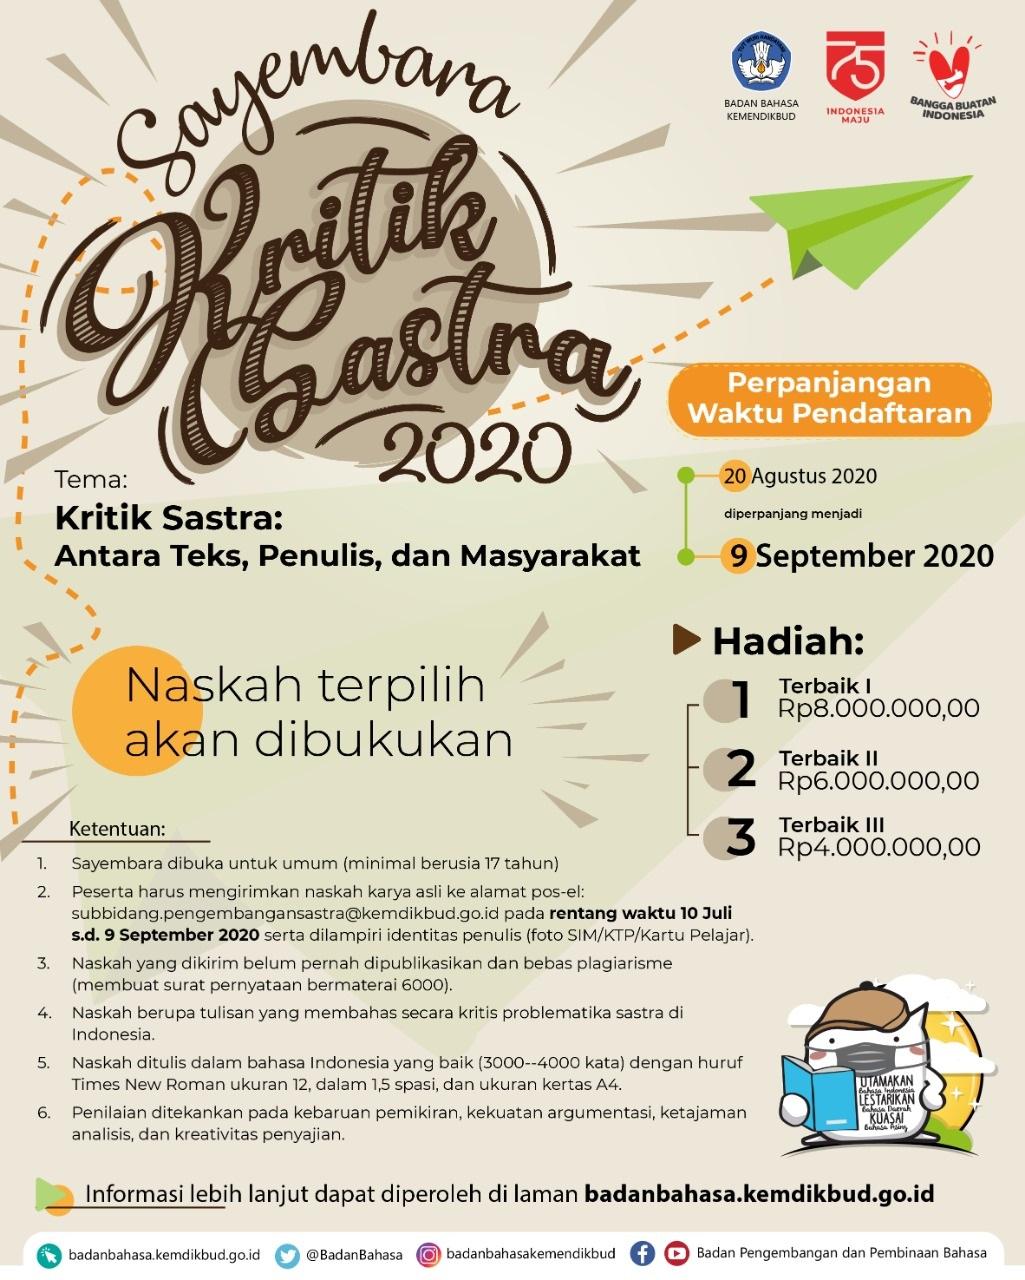 Perpanjangan Waktu Pendaftaran Sayembara Kritik Sastra 2020 Badan Pengembangan Dan Pembinaan Bahasa Kementerian Pendidikan Dan Kebudayaan